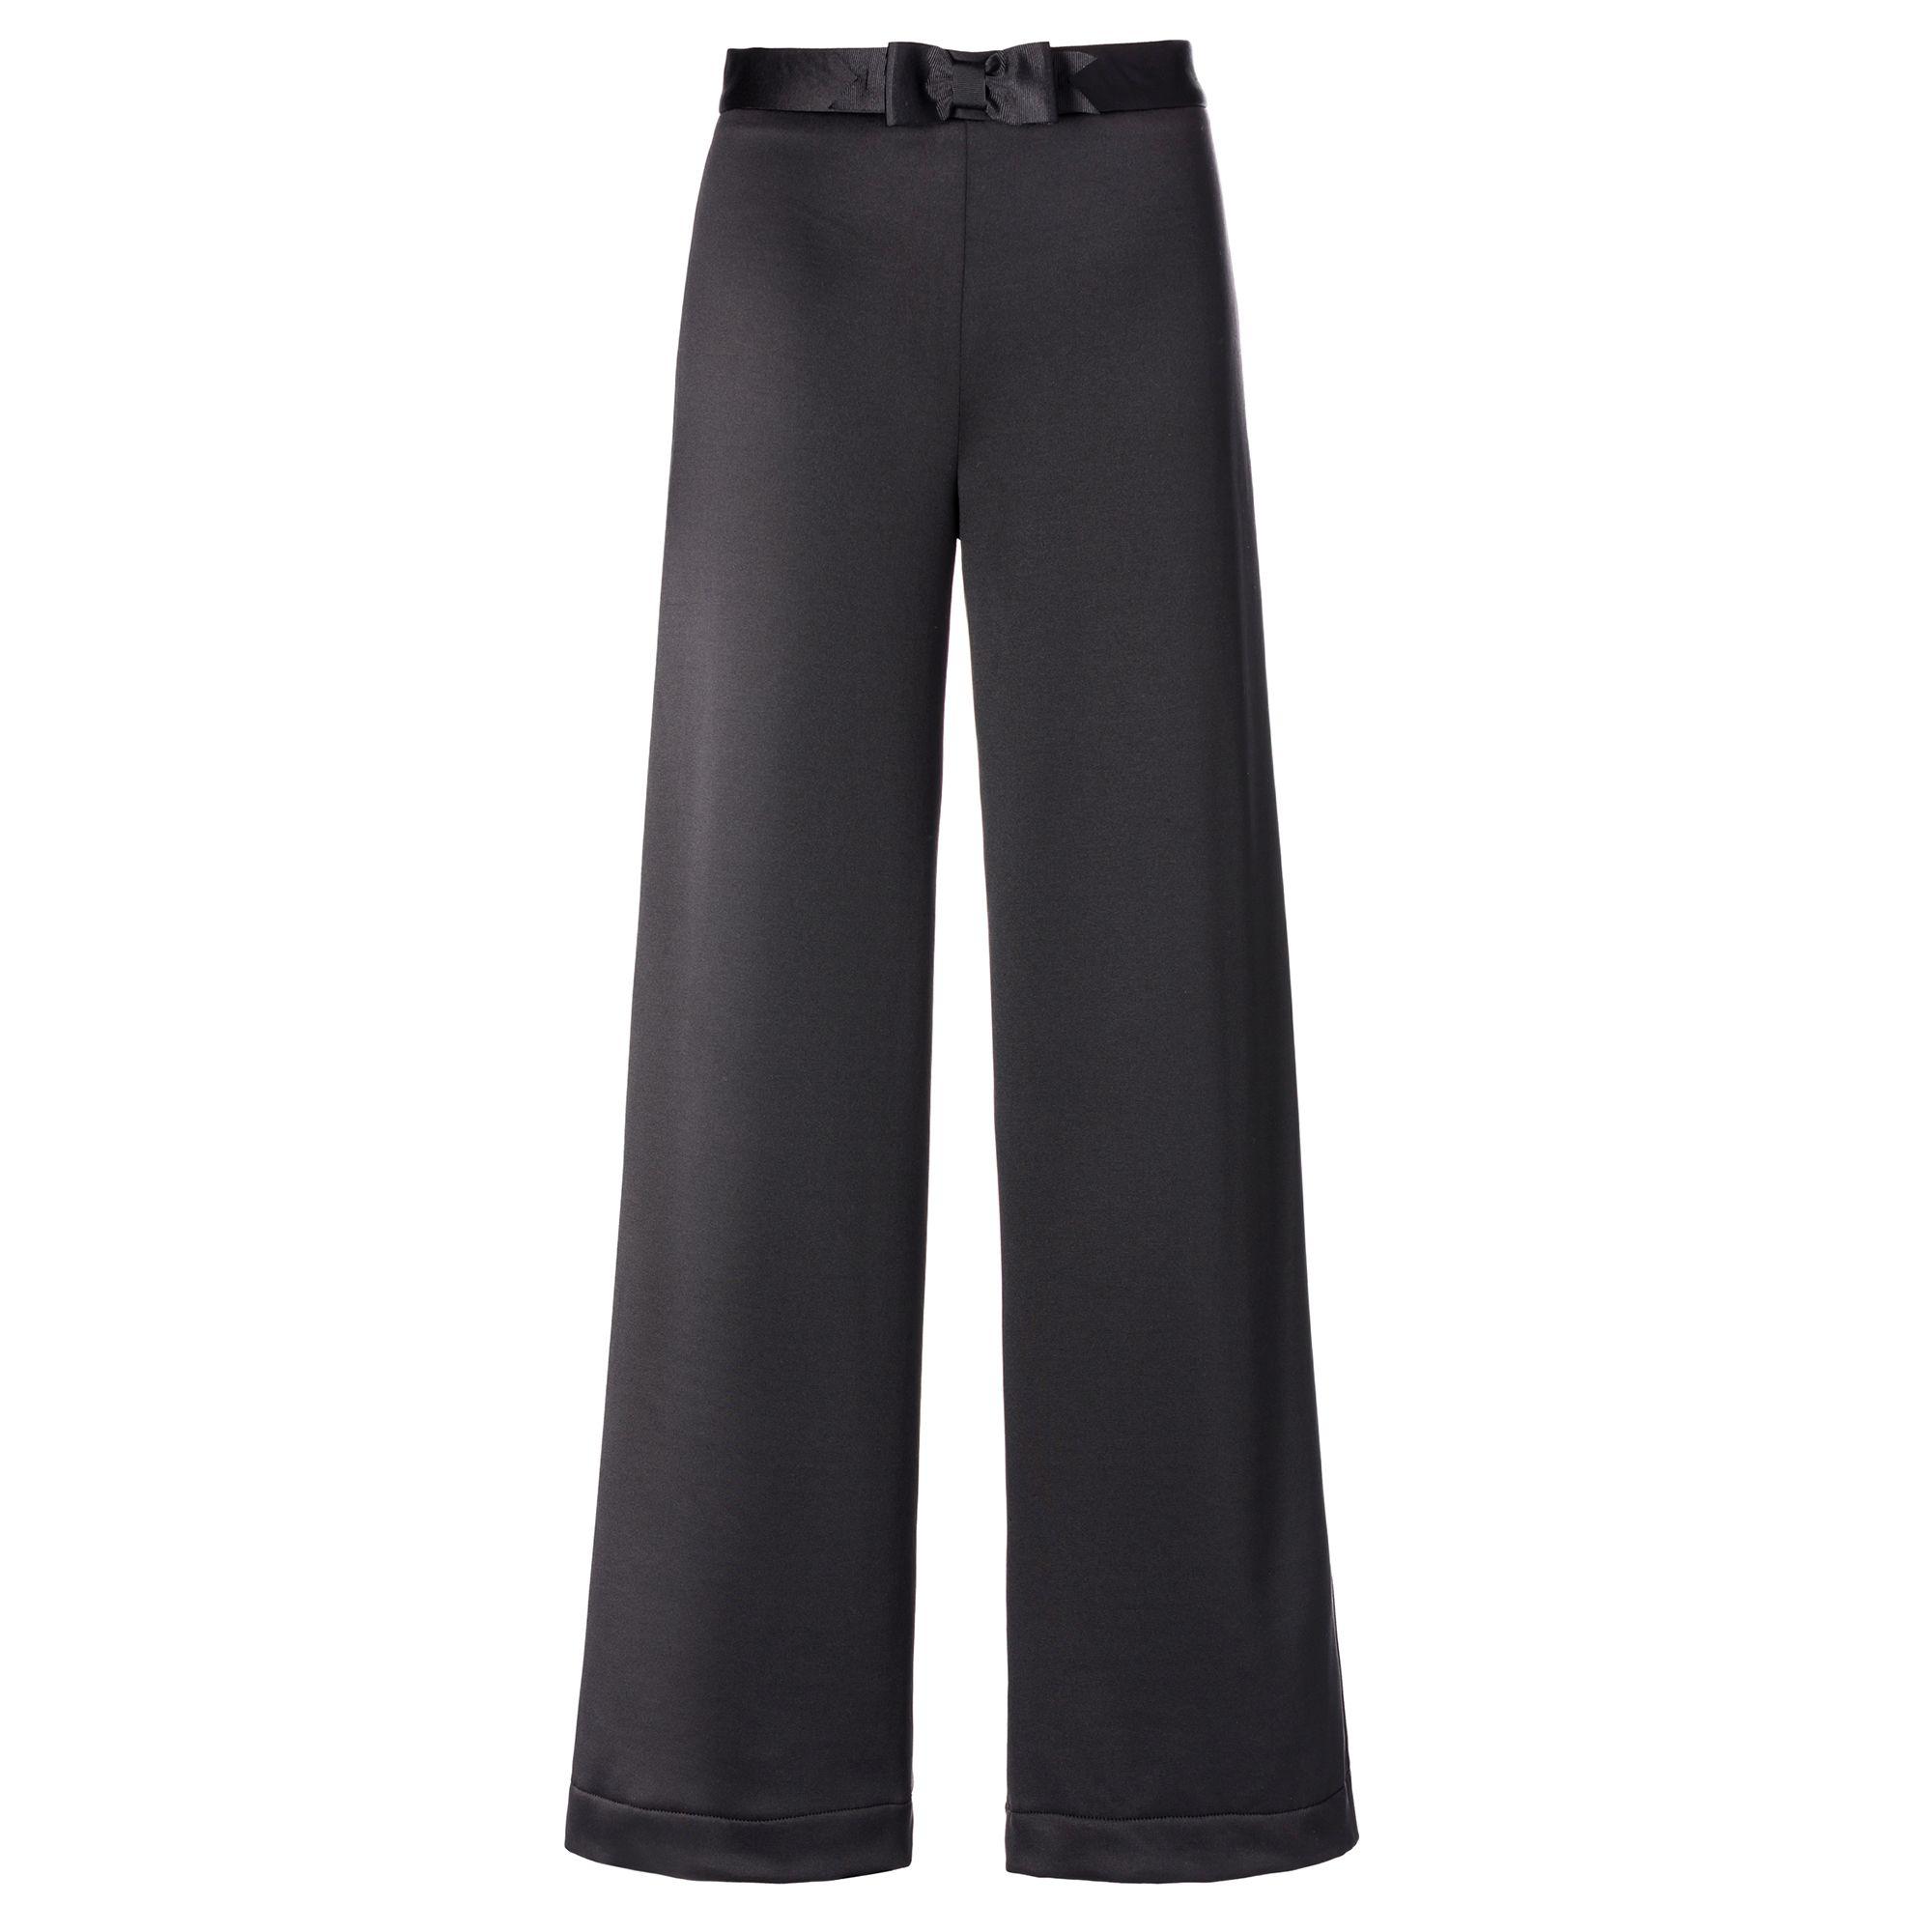 damart pantalon homme taille elastique stunning damart pantalon taille neuf with damart. Black Bedroom Furniture Sets. Home Design Ideas